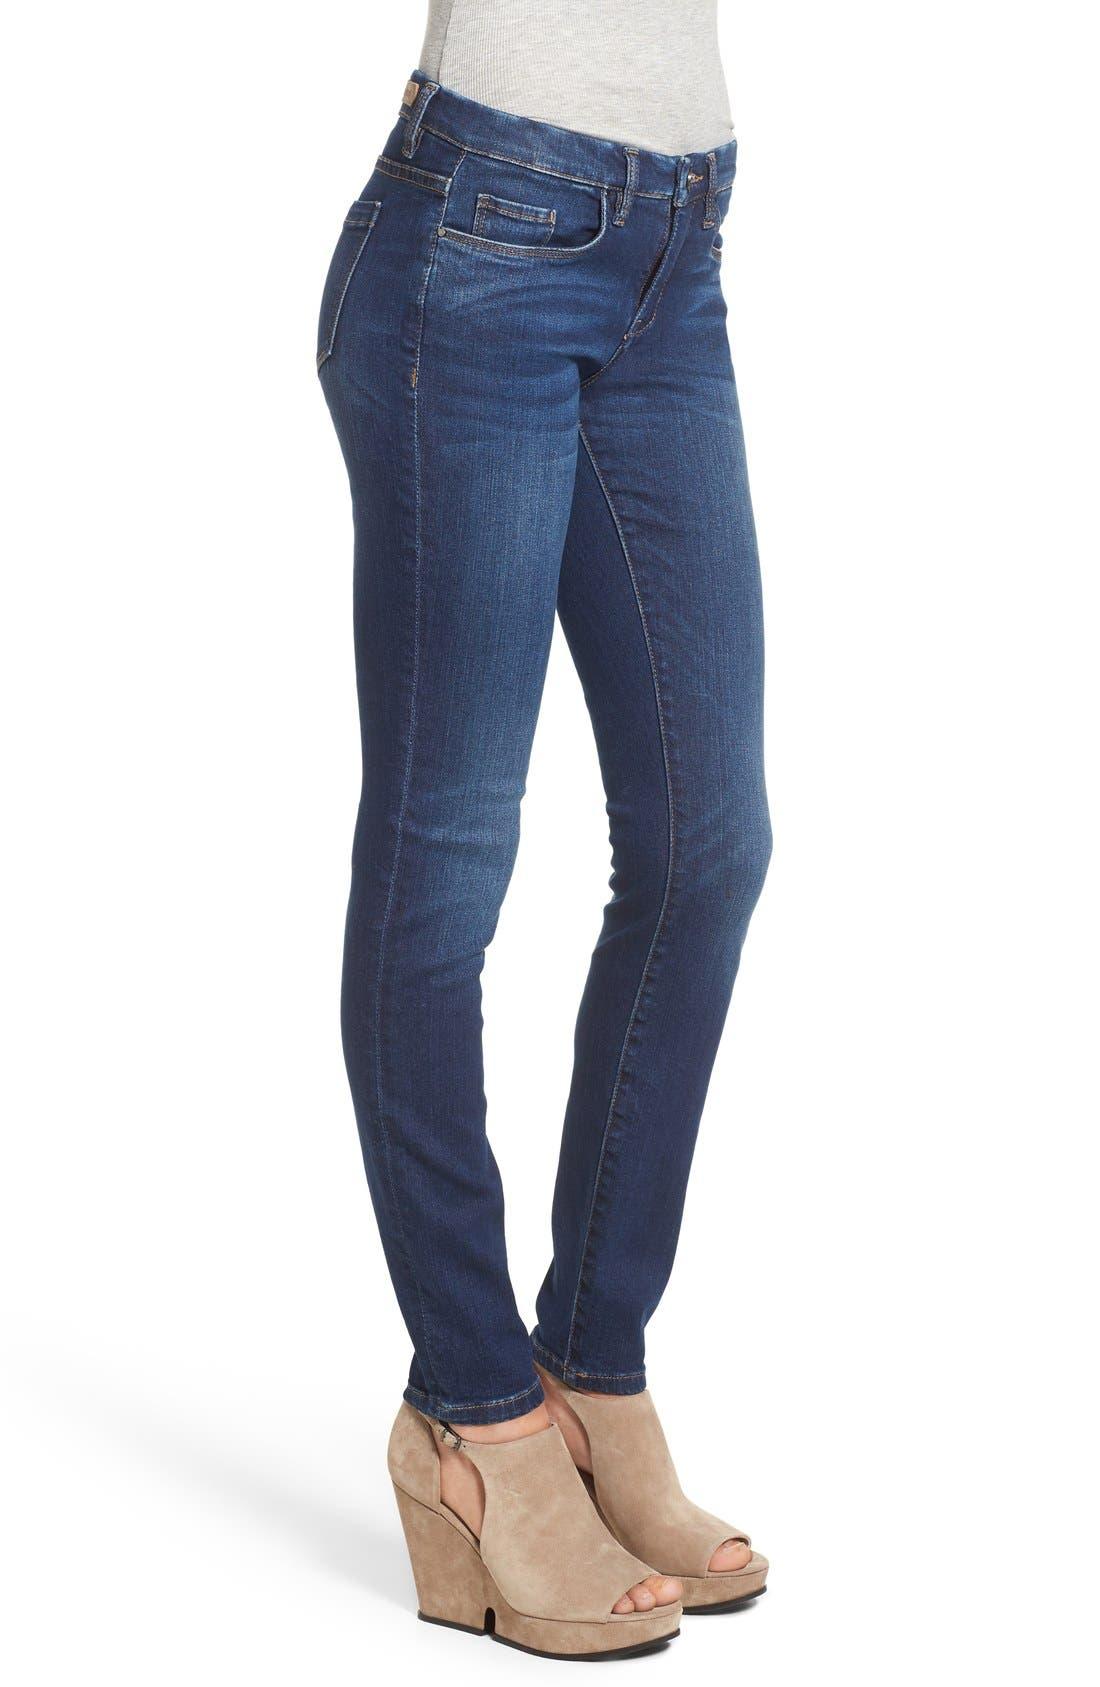 Alternate Image 3  - BLANKNYC 'Buffering' Skinny Jeans (Call it Karma)